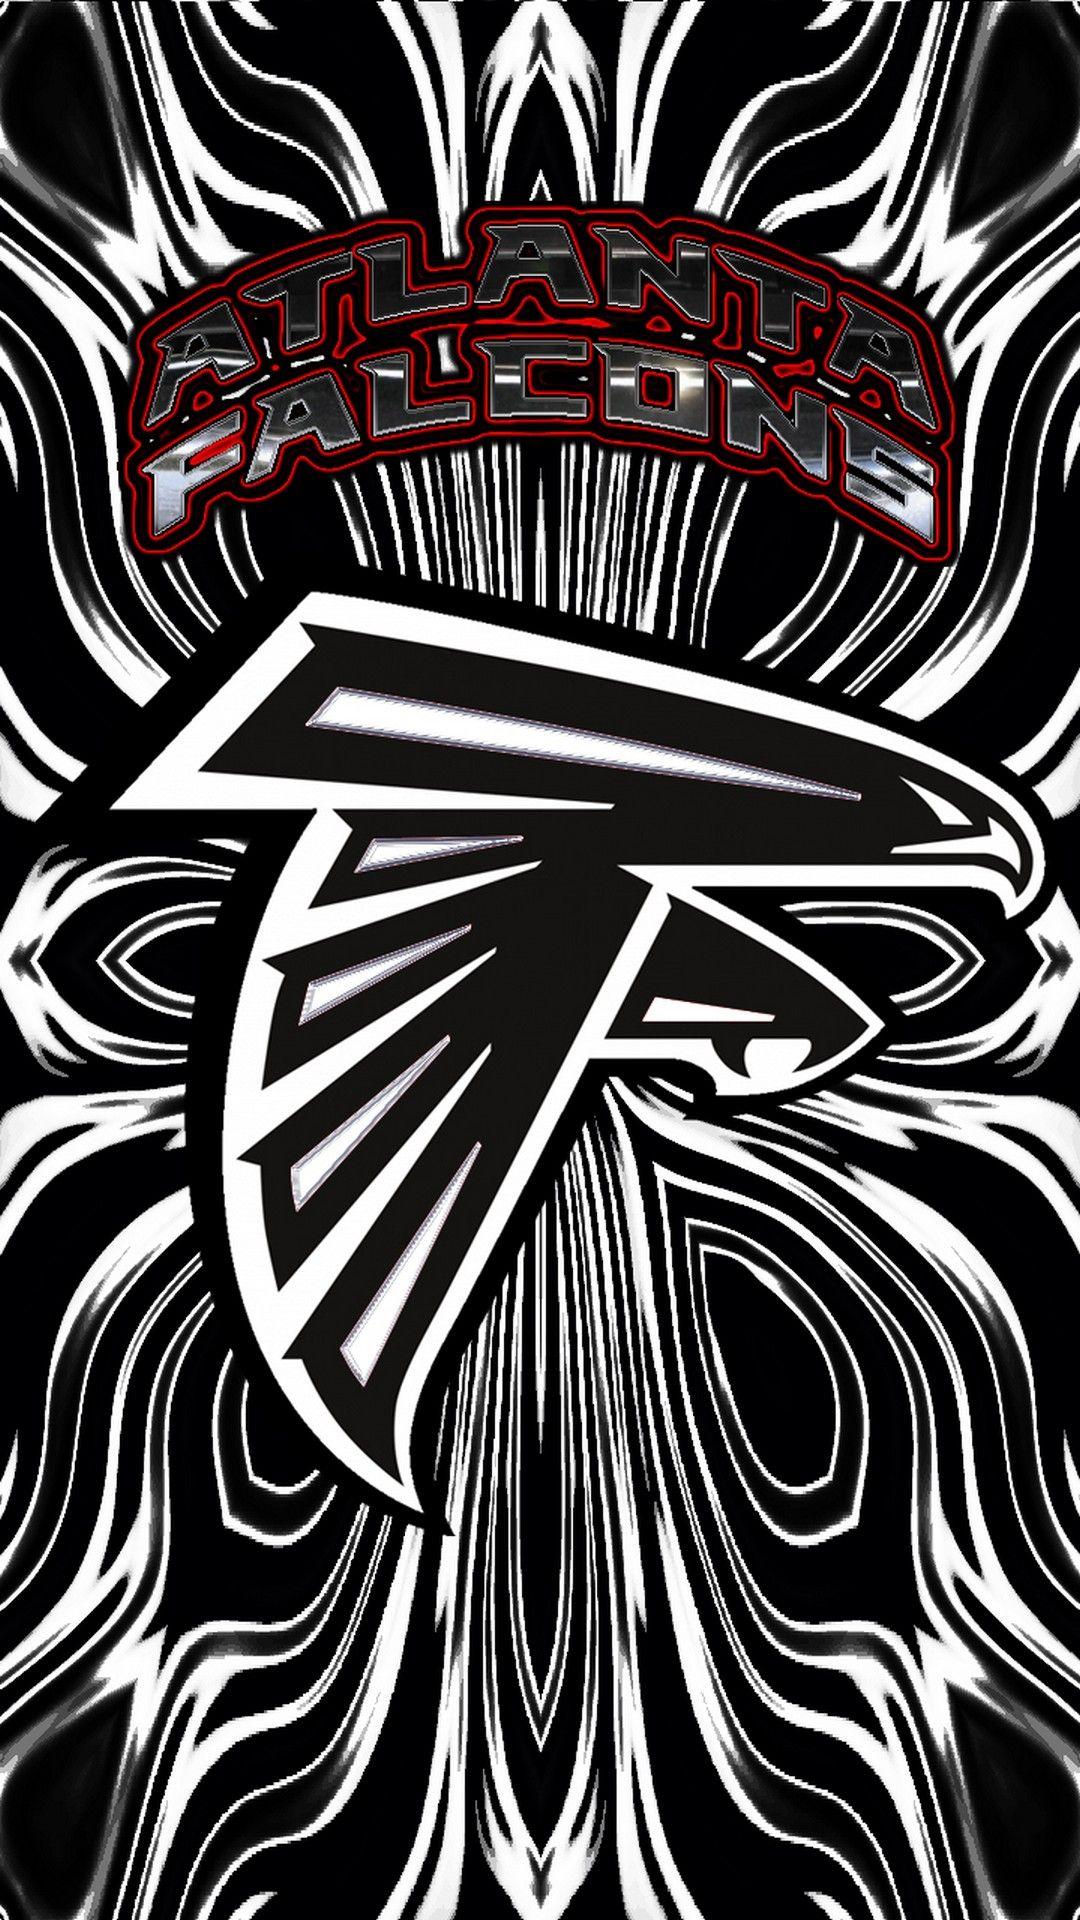 Pin by Caleb Harris on Jose in 2020 Atlanta falcons